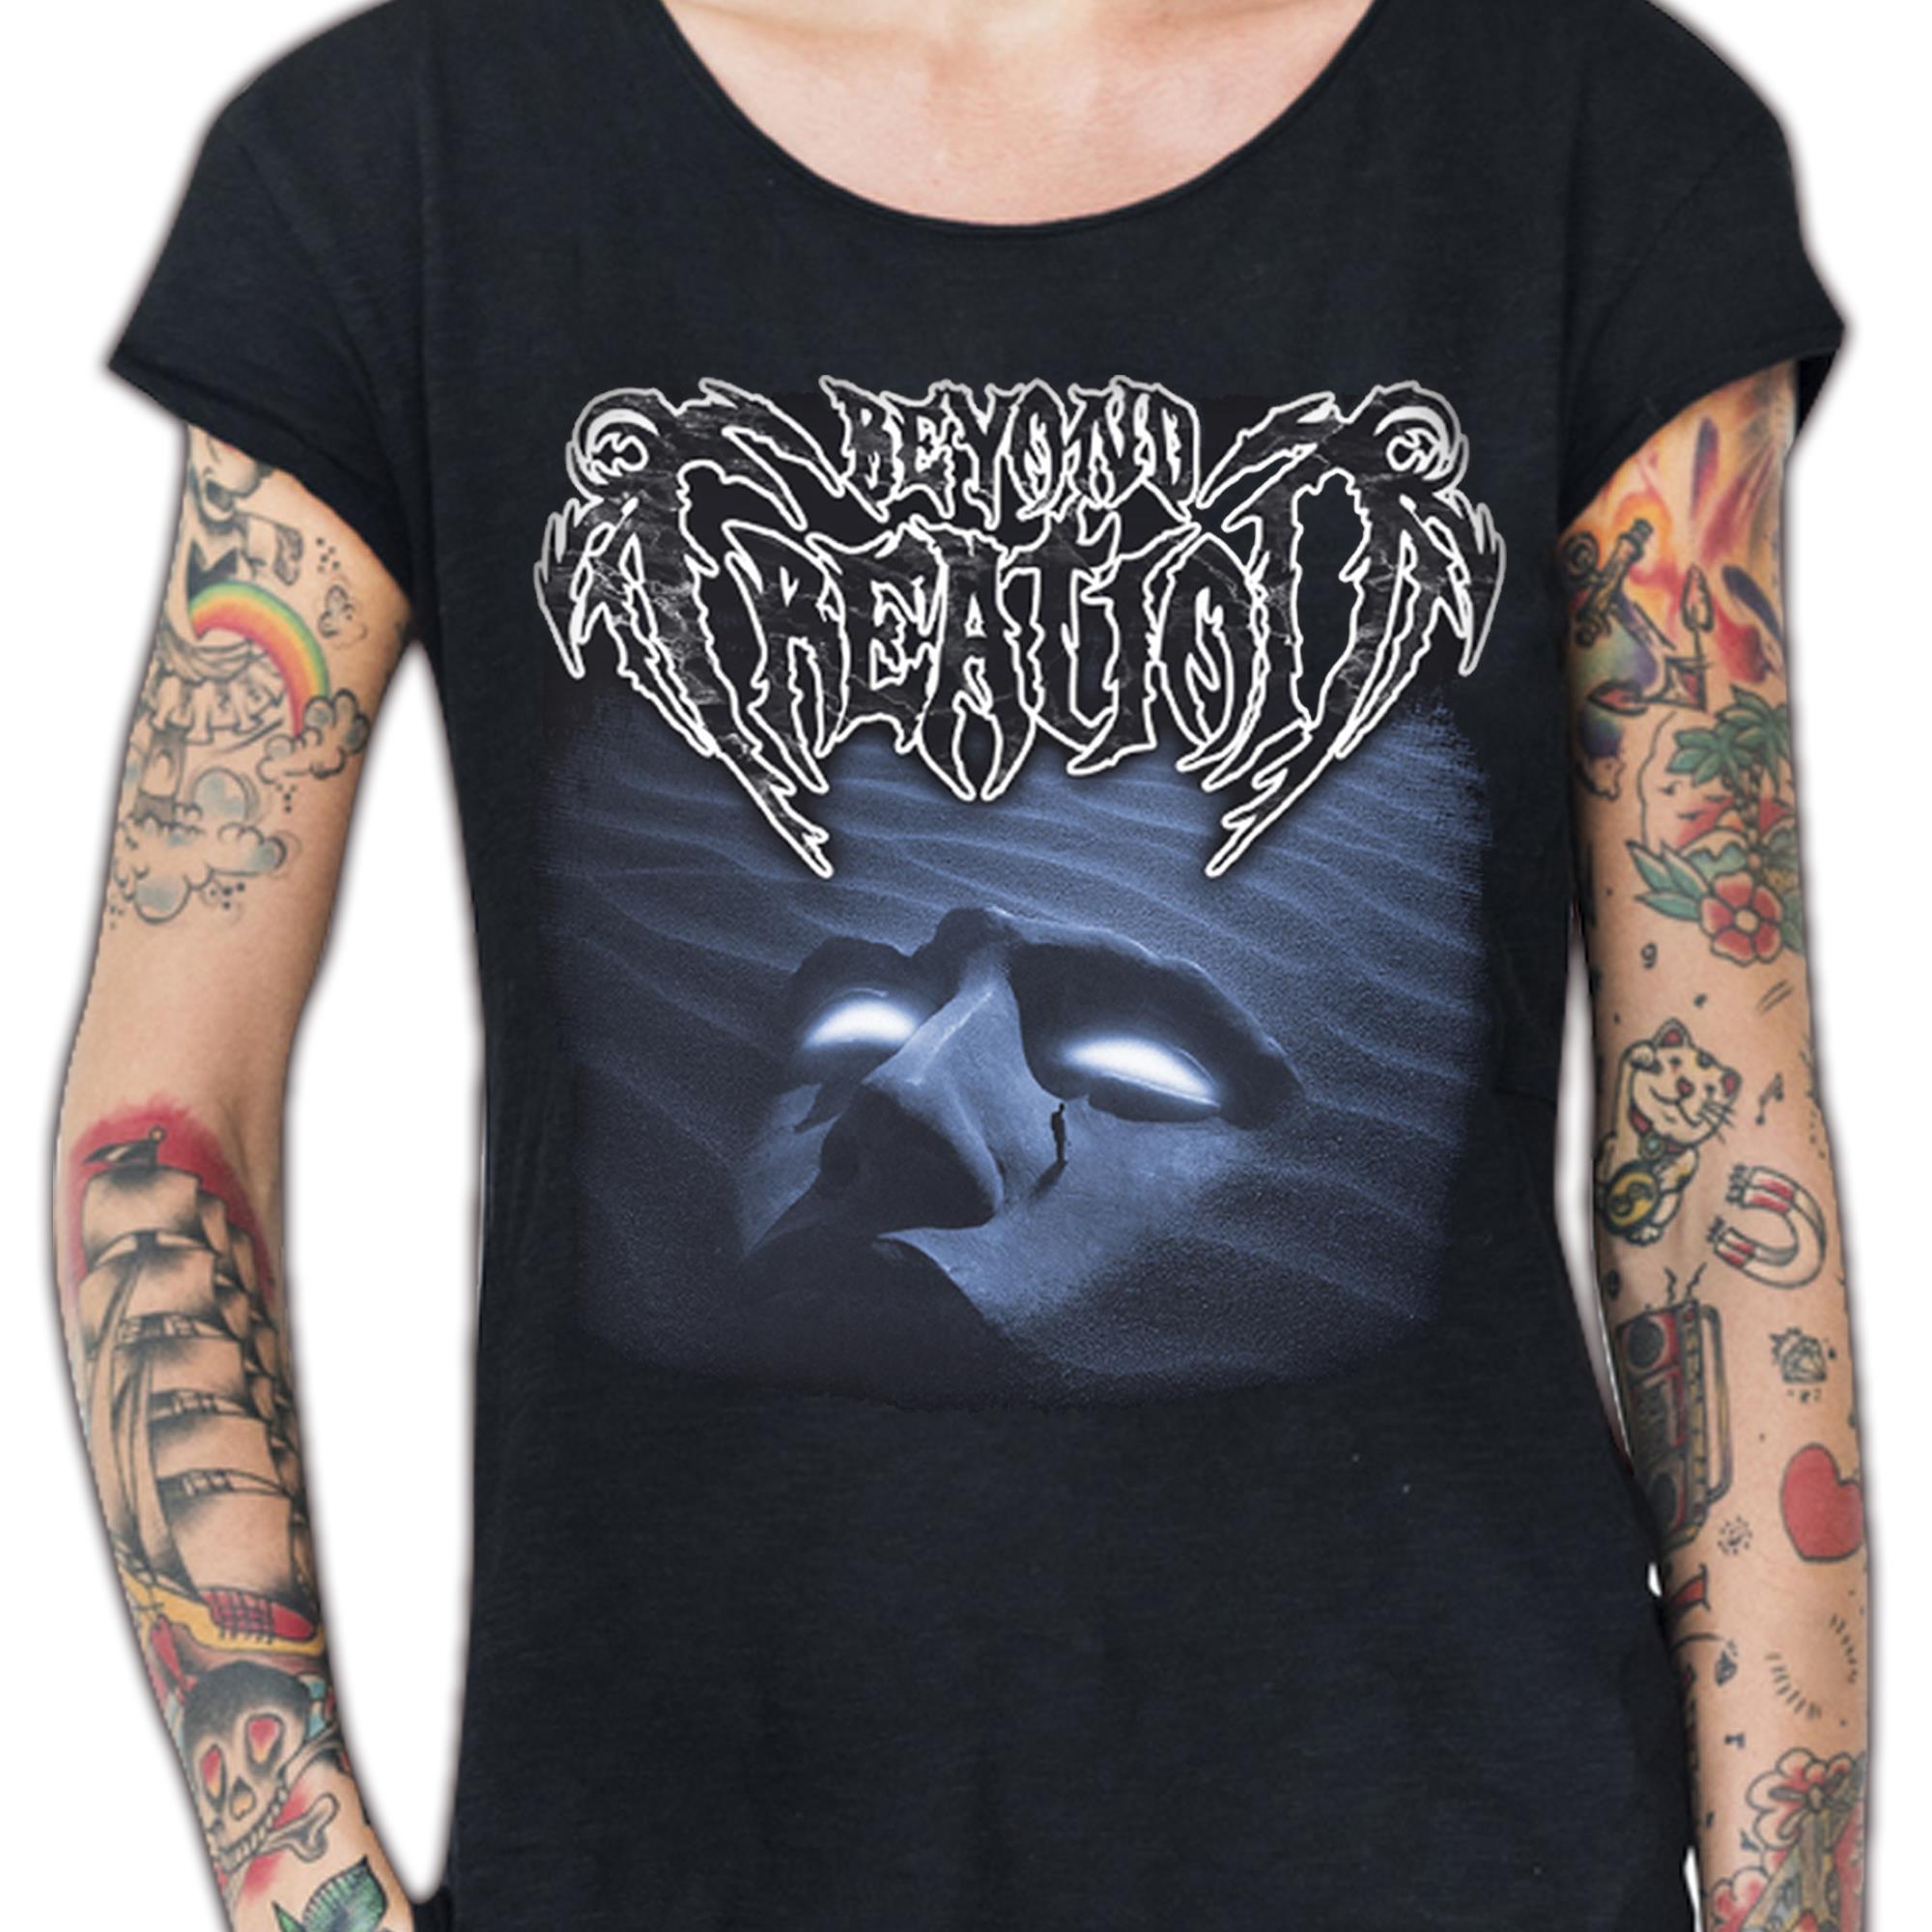 Surfaces Echoes (Women) T-Shirt